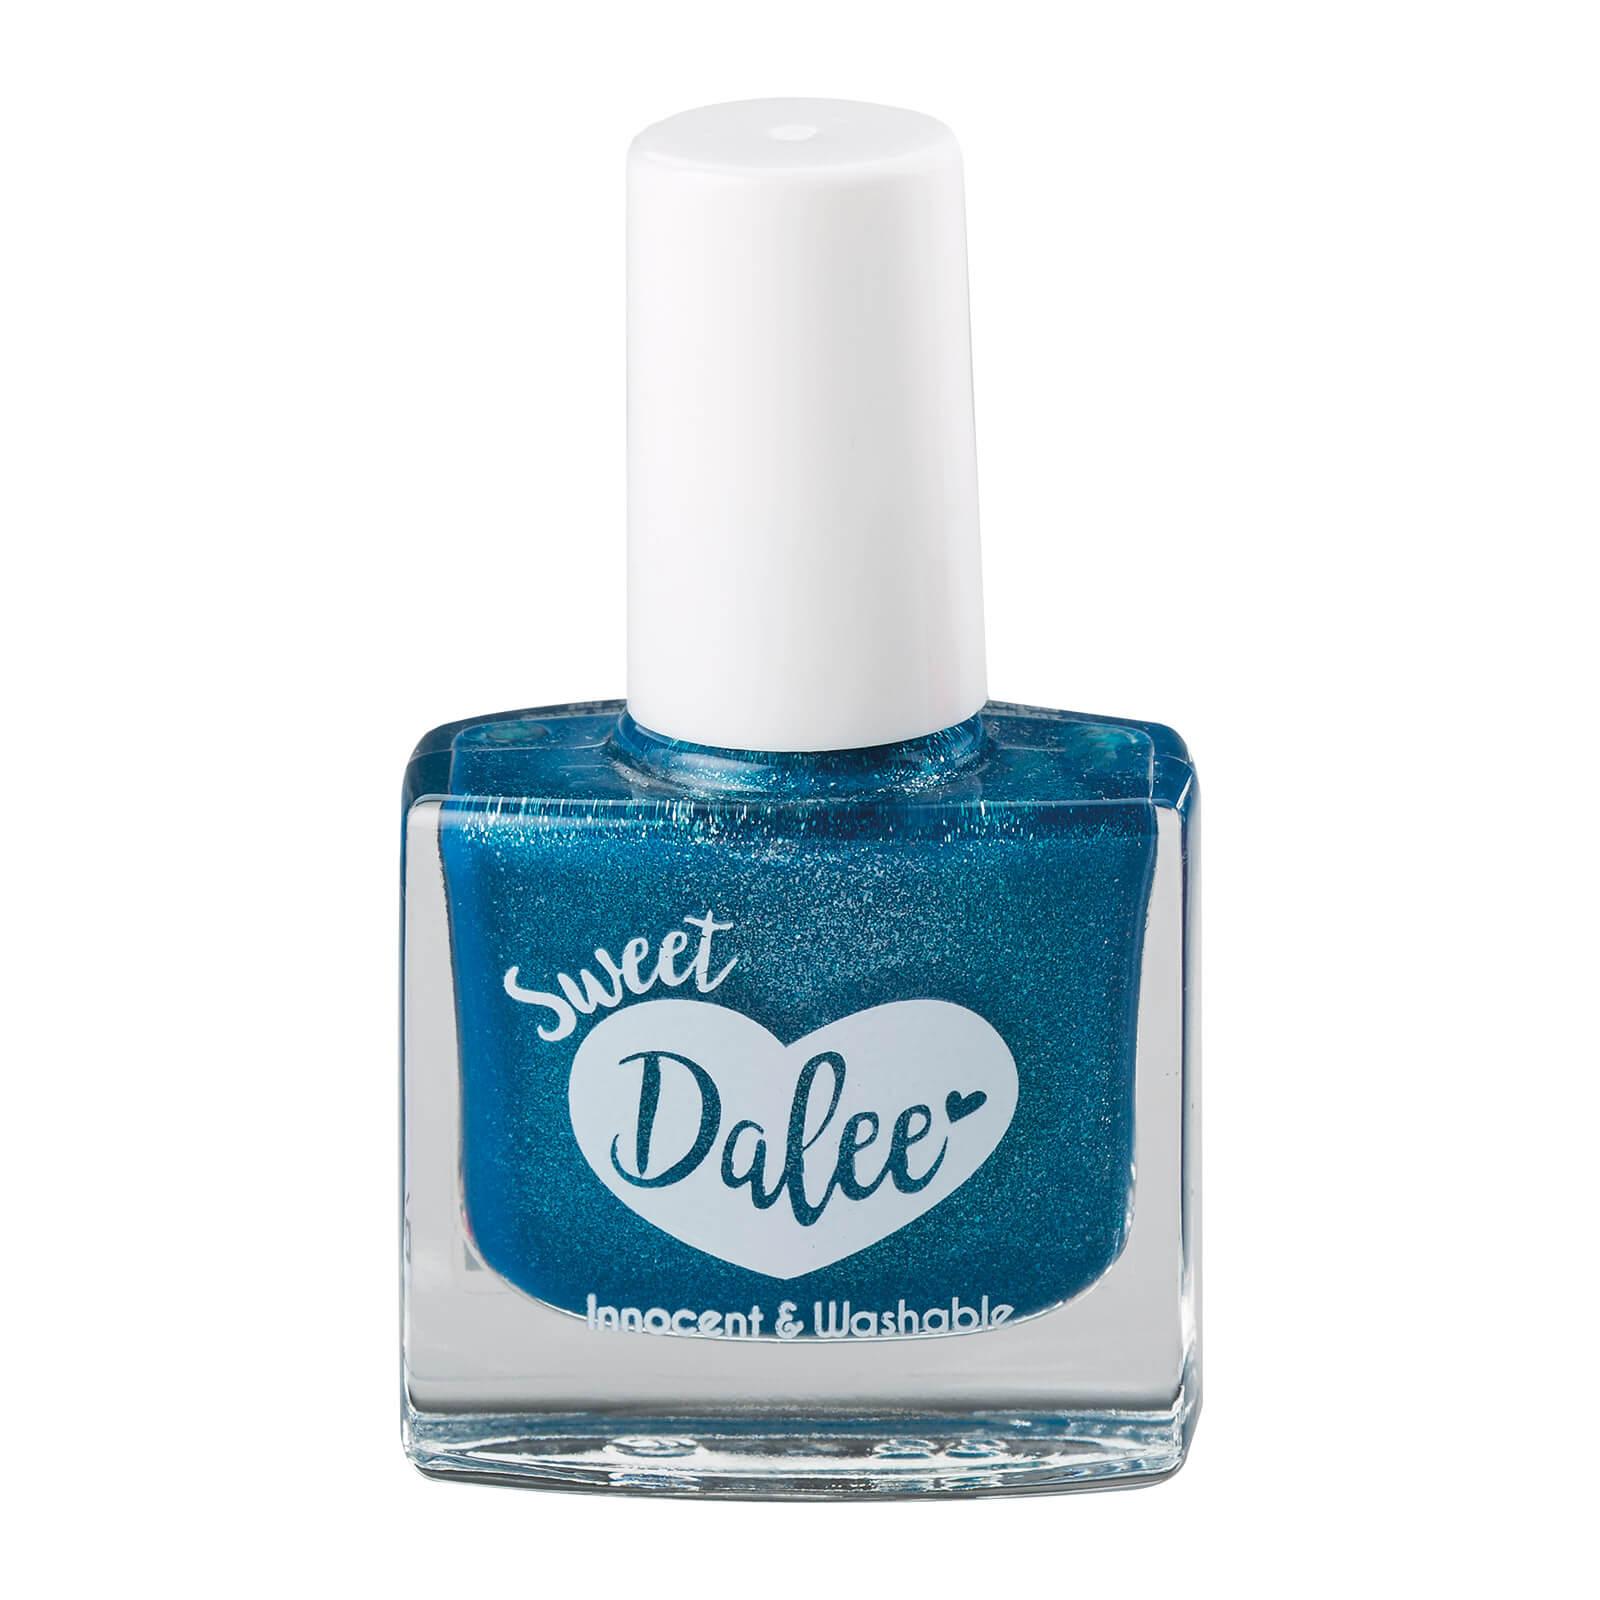 Medisei Sweet DaleeNail Polish ΠαιδικόΒερνίκι Νυχιών με Βάση το Νερό σε Διάφορα Χρώματα 12ml – Glam Girl (907)